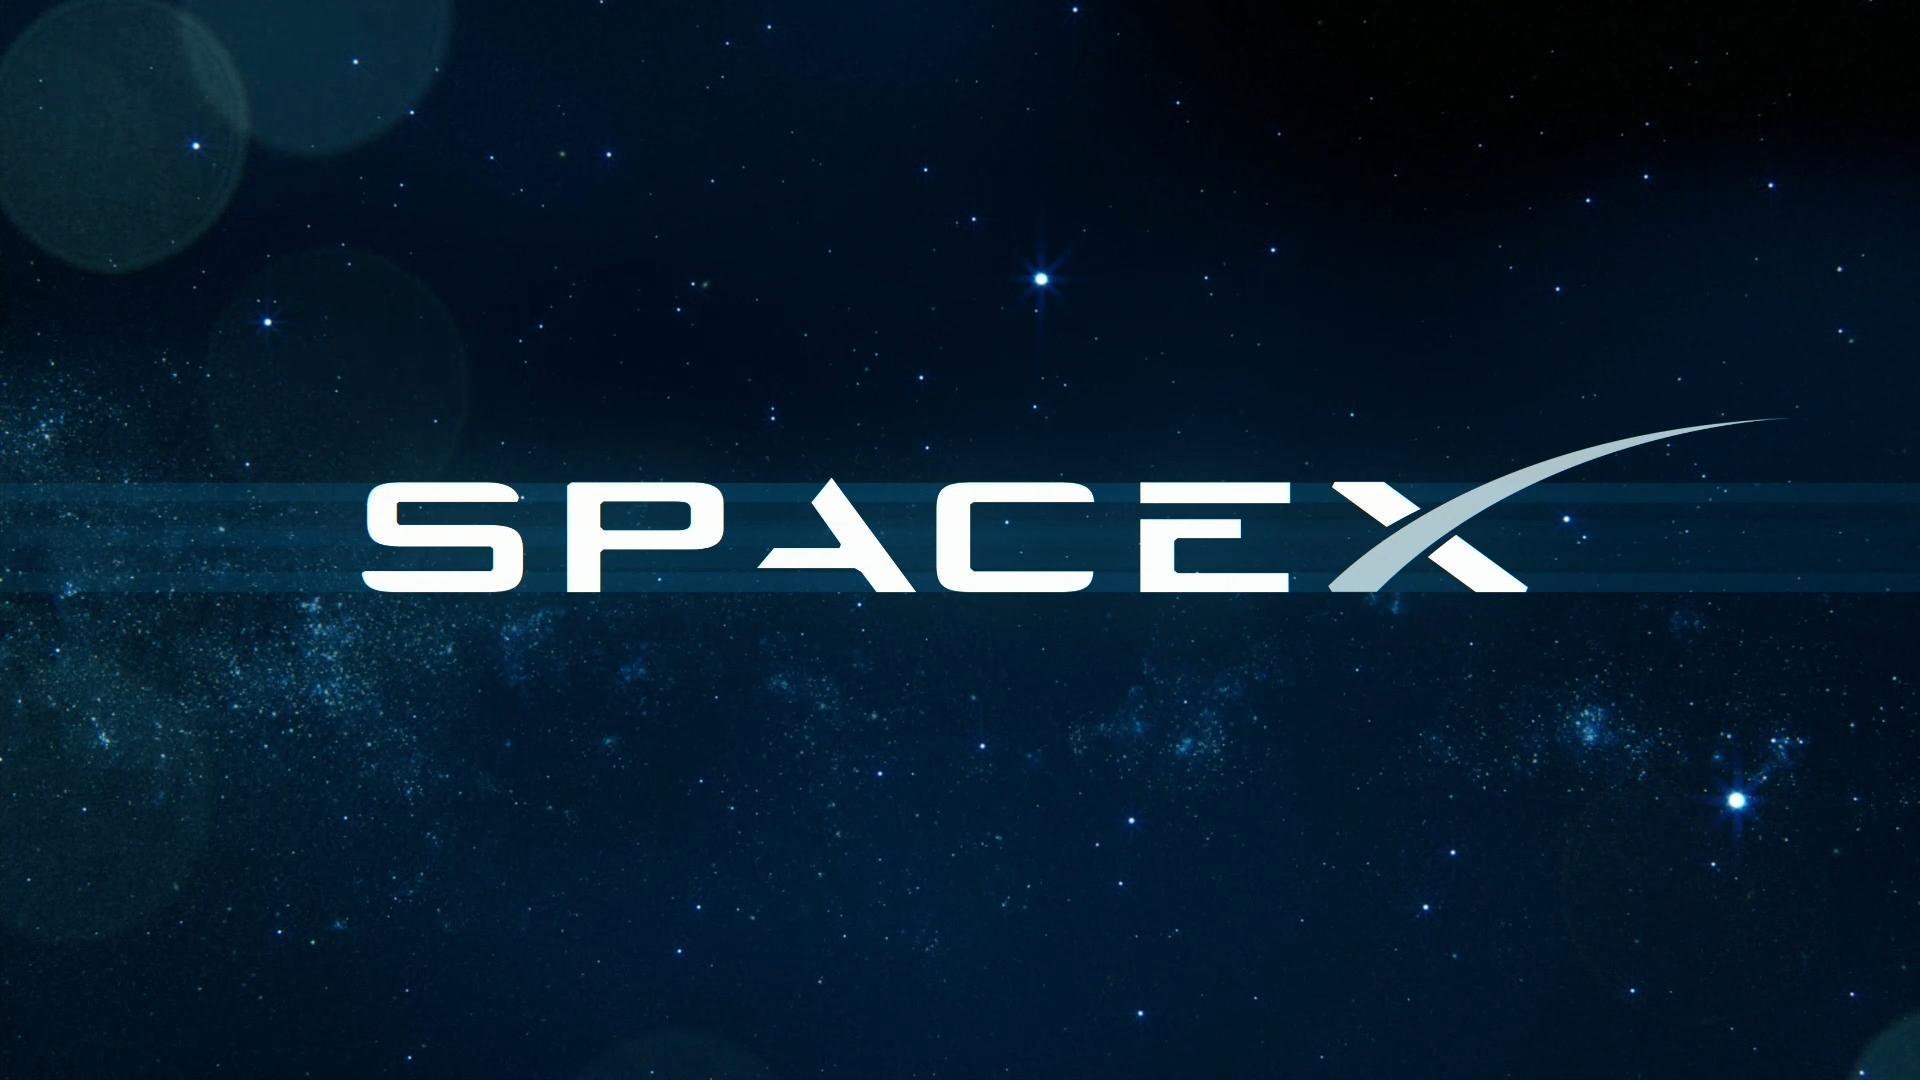 Elon Musk wyśle rakietę Flying Dragon 2 na Marsa